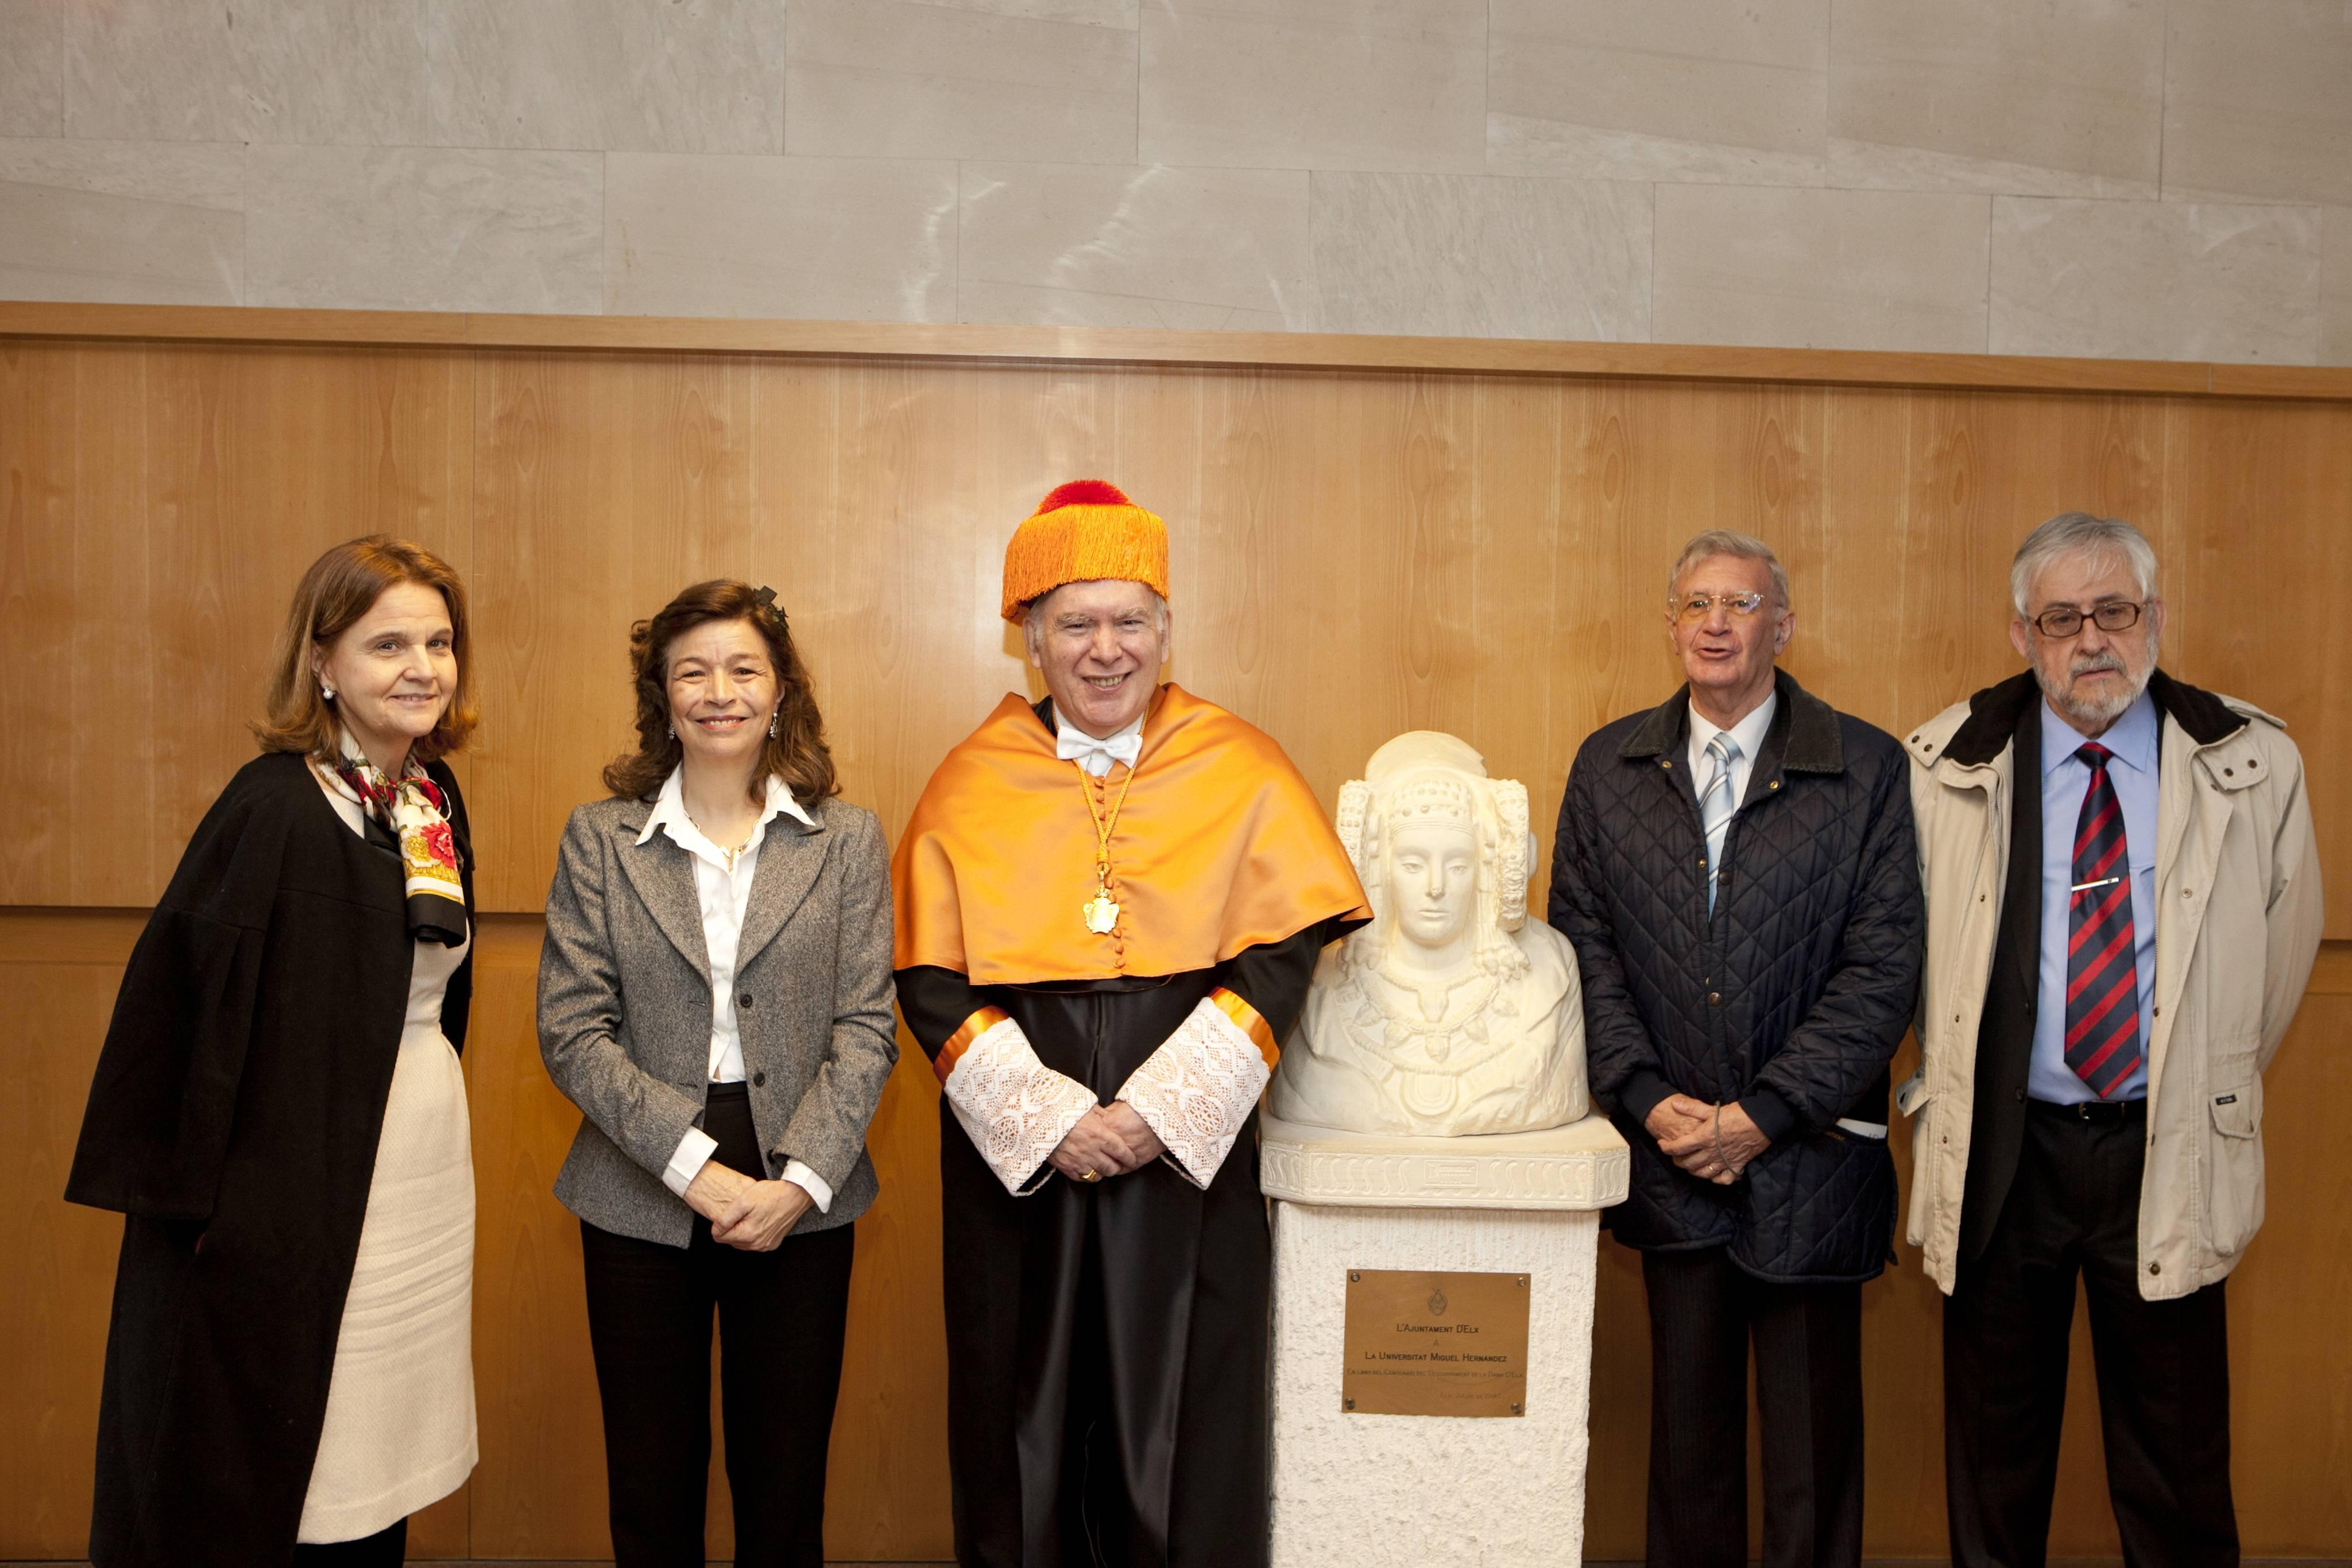 doctor-honoris-causa-luis-gamir_mg_1305.jpg